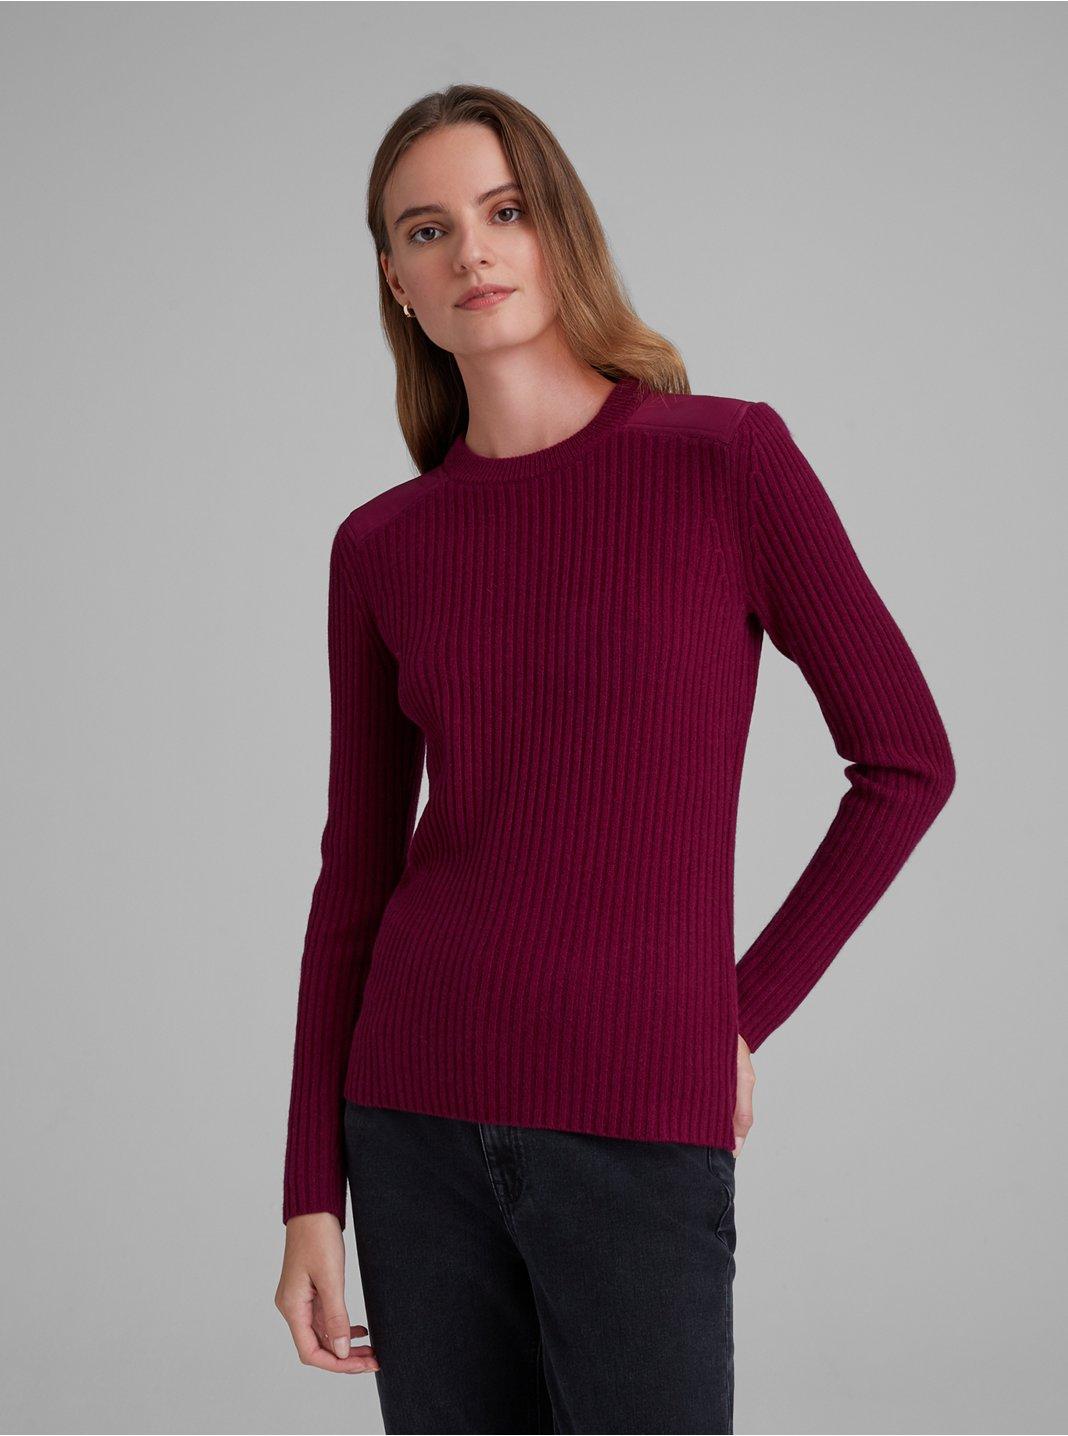 Woven Yolk Cashmere Sweater